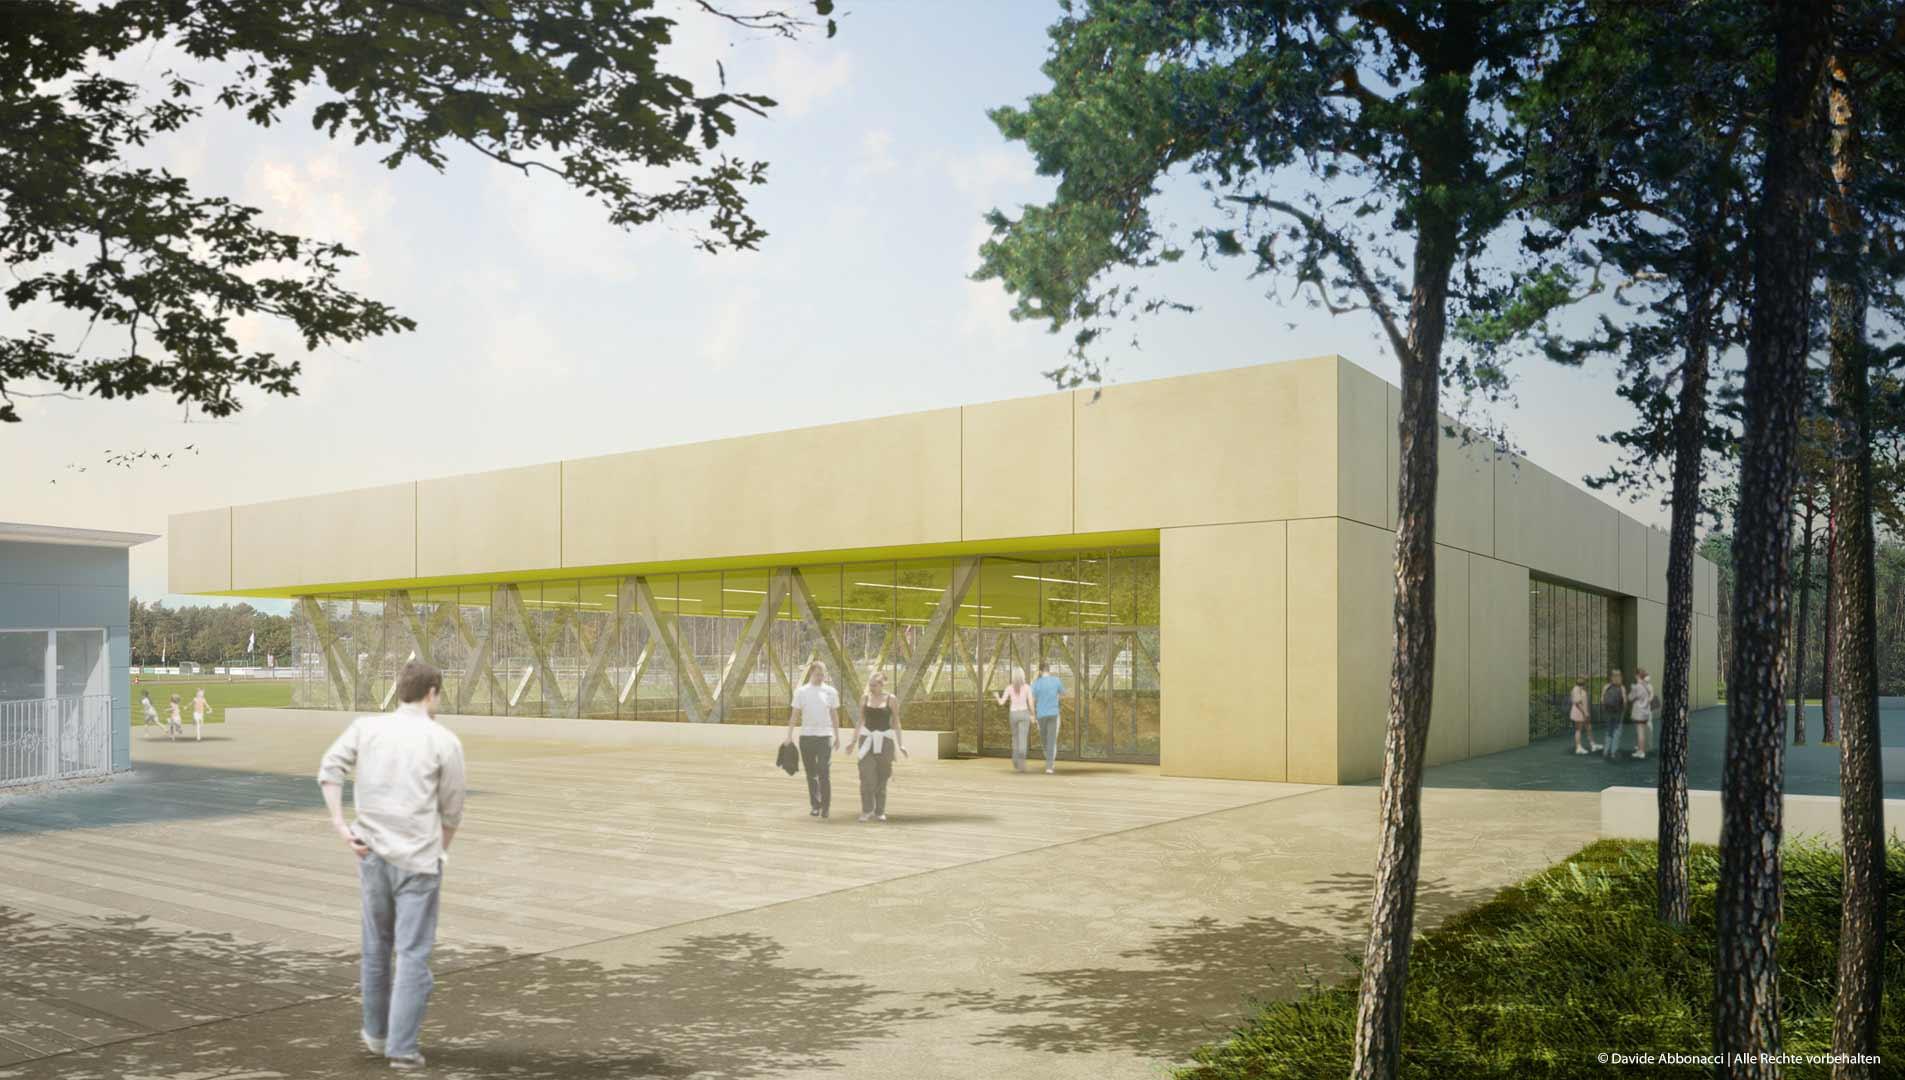 Sporthalle Borgsdorf, Berlin | Numrich Albrecht Klumpp Architekten | 2012 Projektvisualisierung